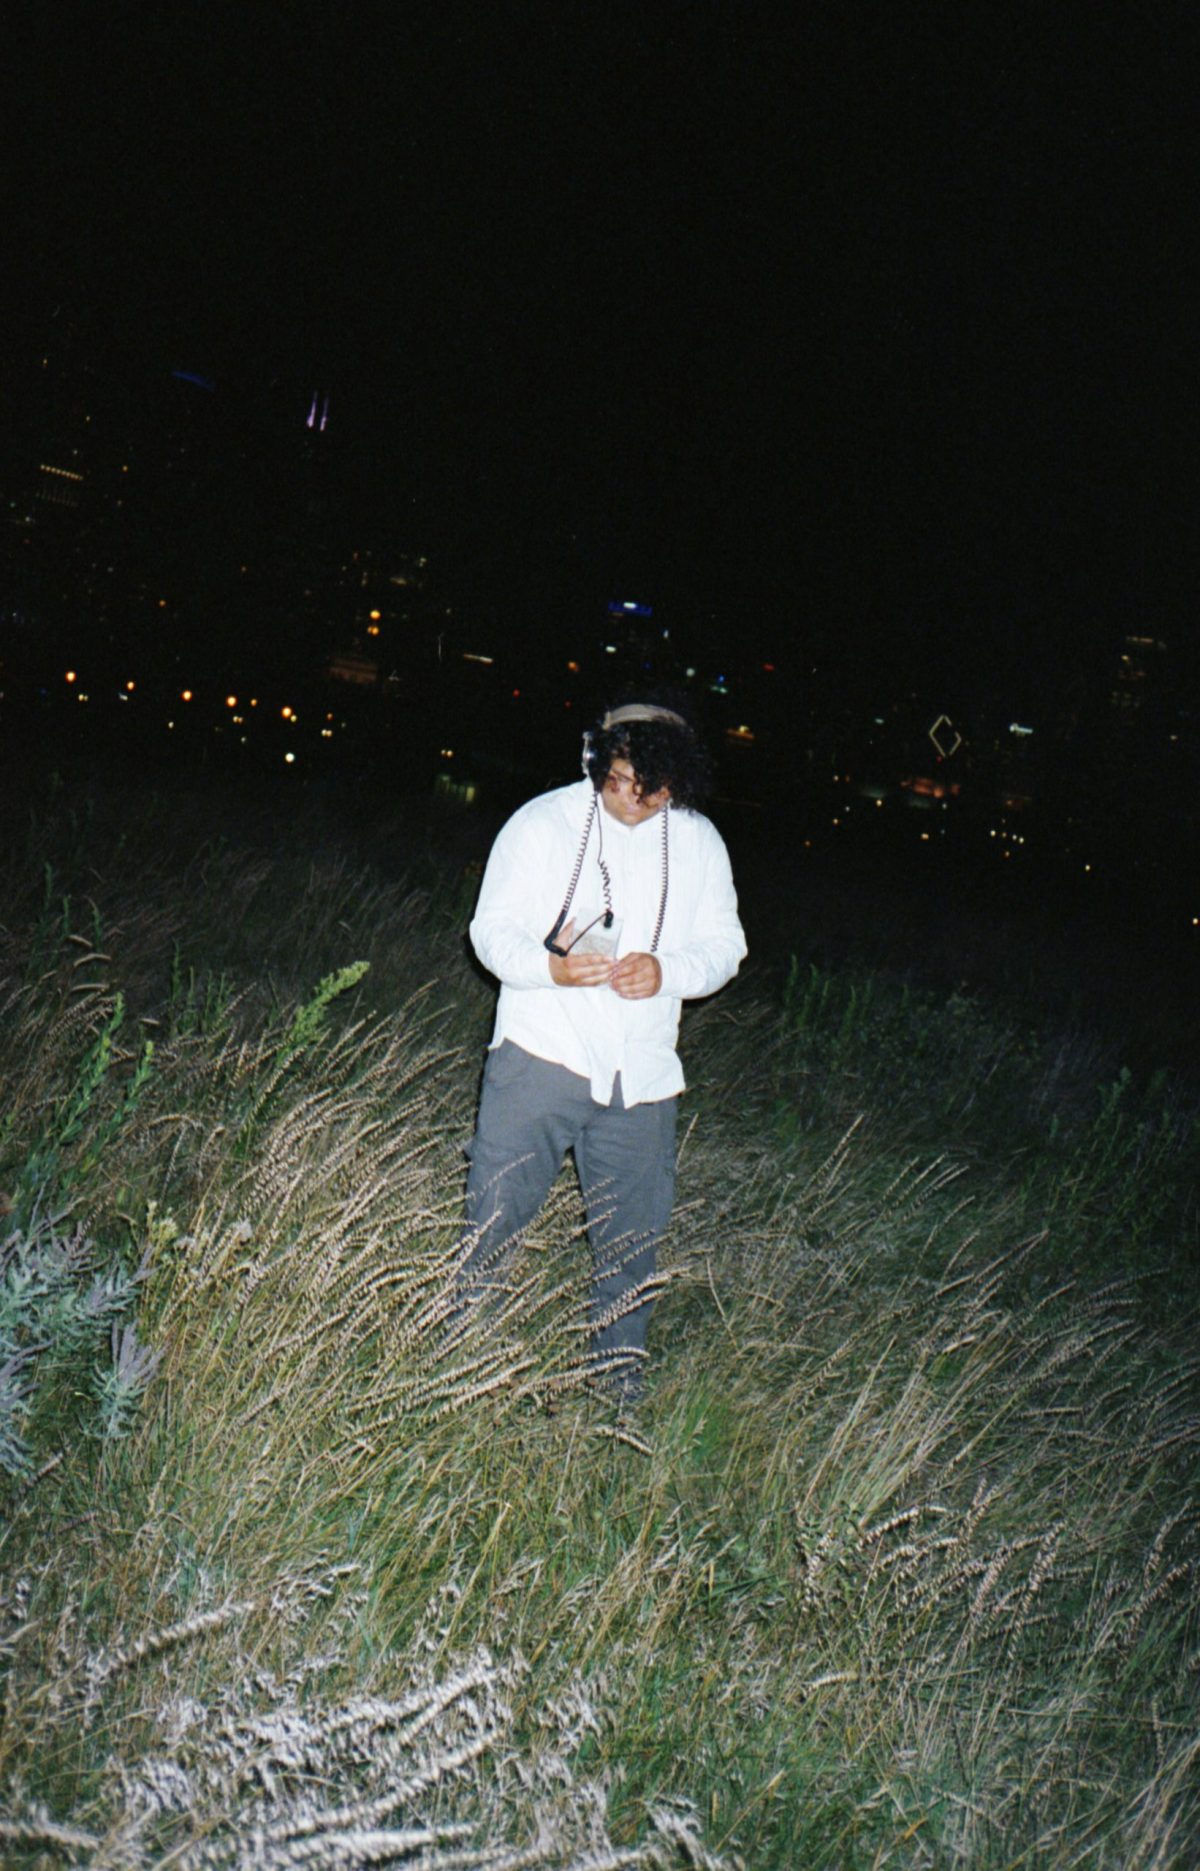 Man wearing headphones standing in field at night